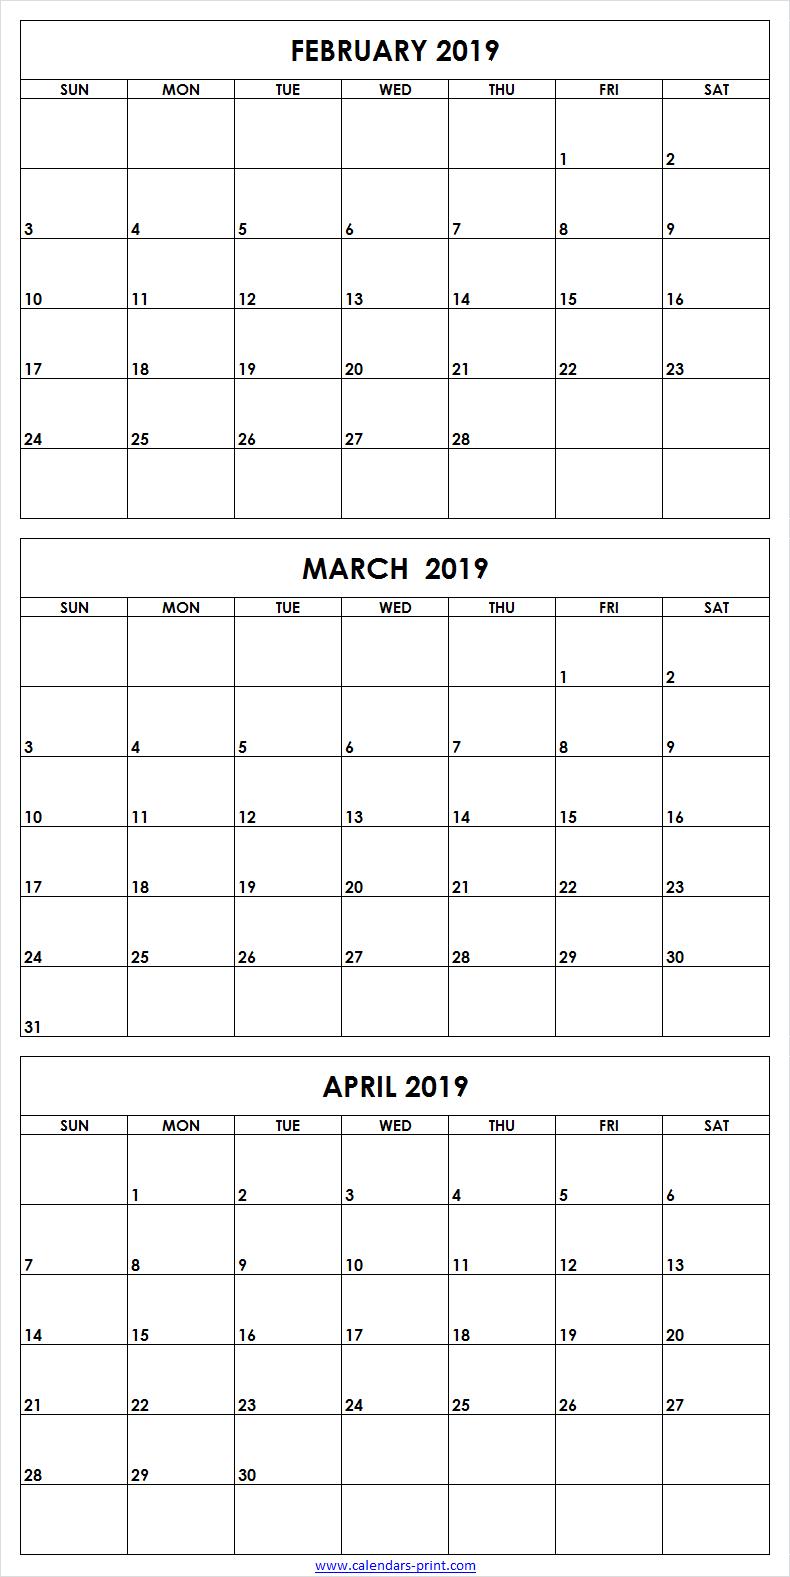 3 Month February To April 2019 Calendar Template   February 2019 Calendar 2019 3 Months